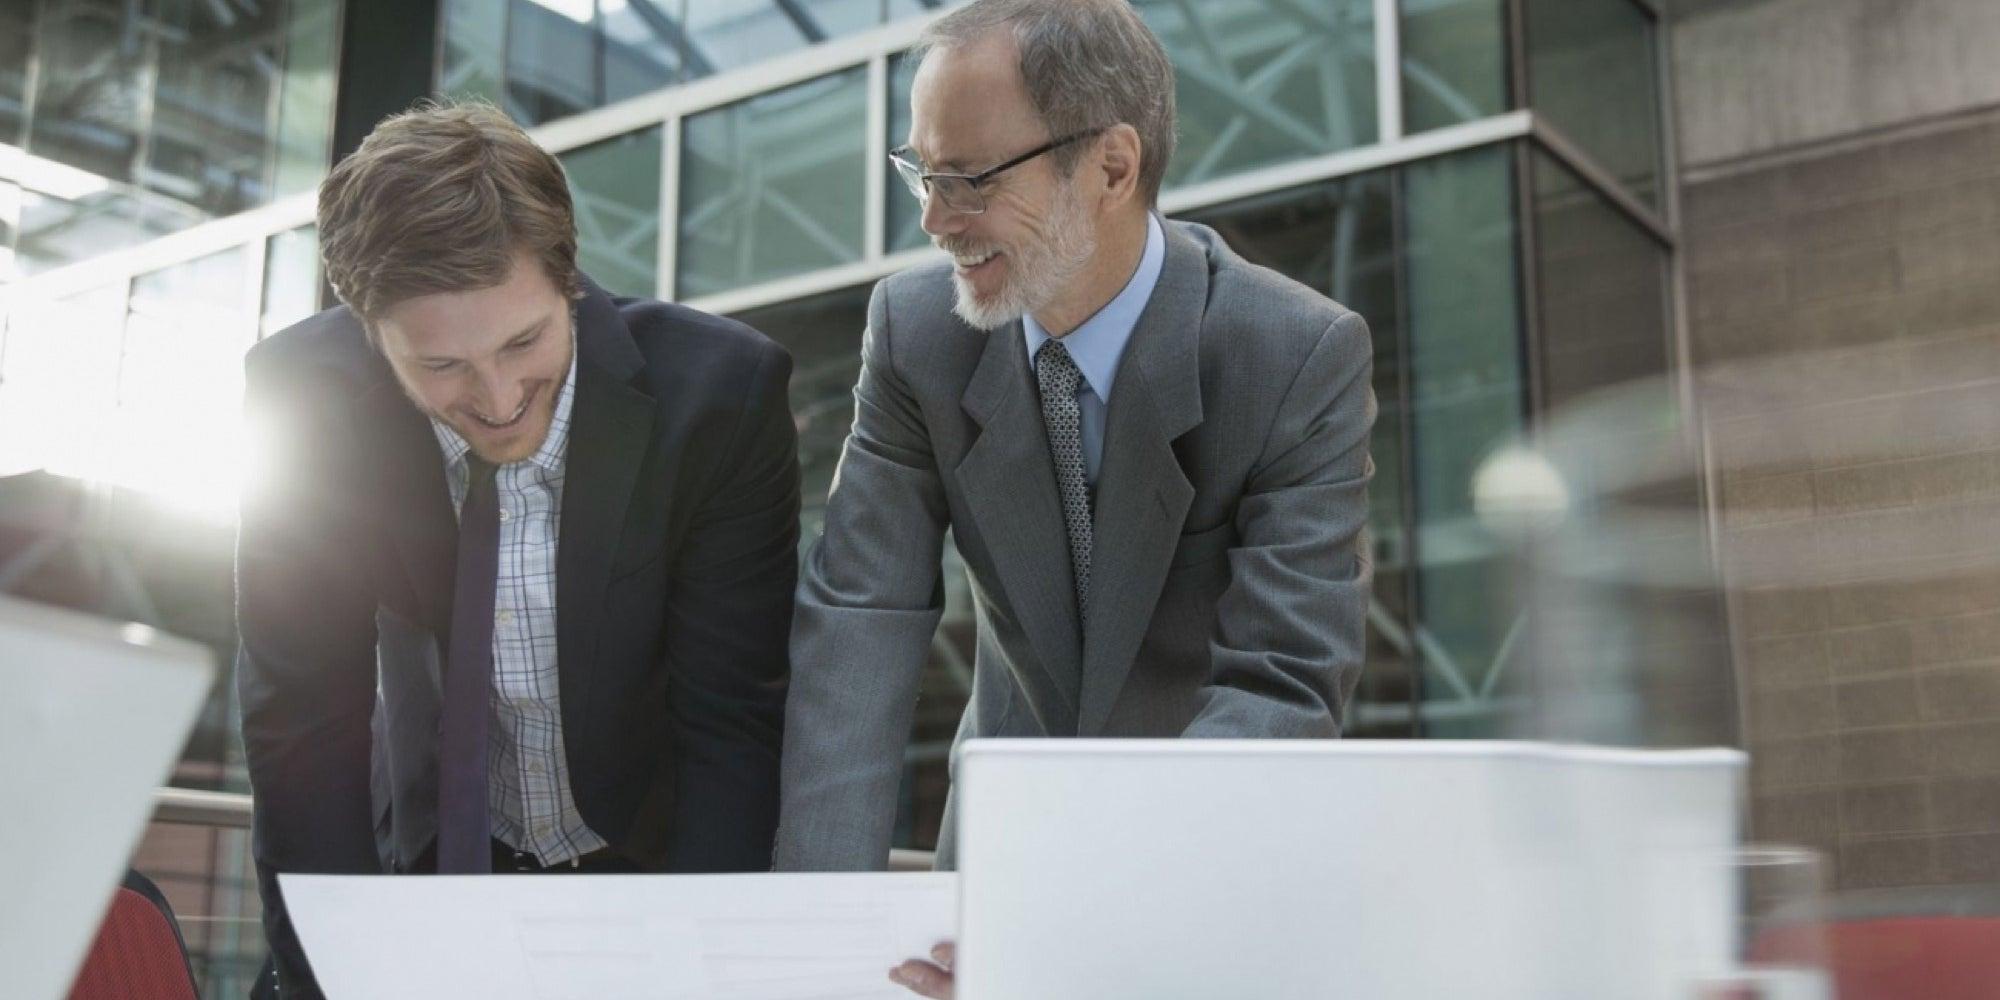 How 3 Innovative Startups Plan to Grow Through Mentoring